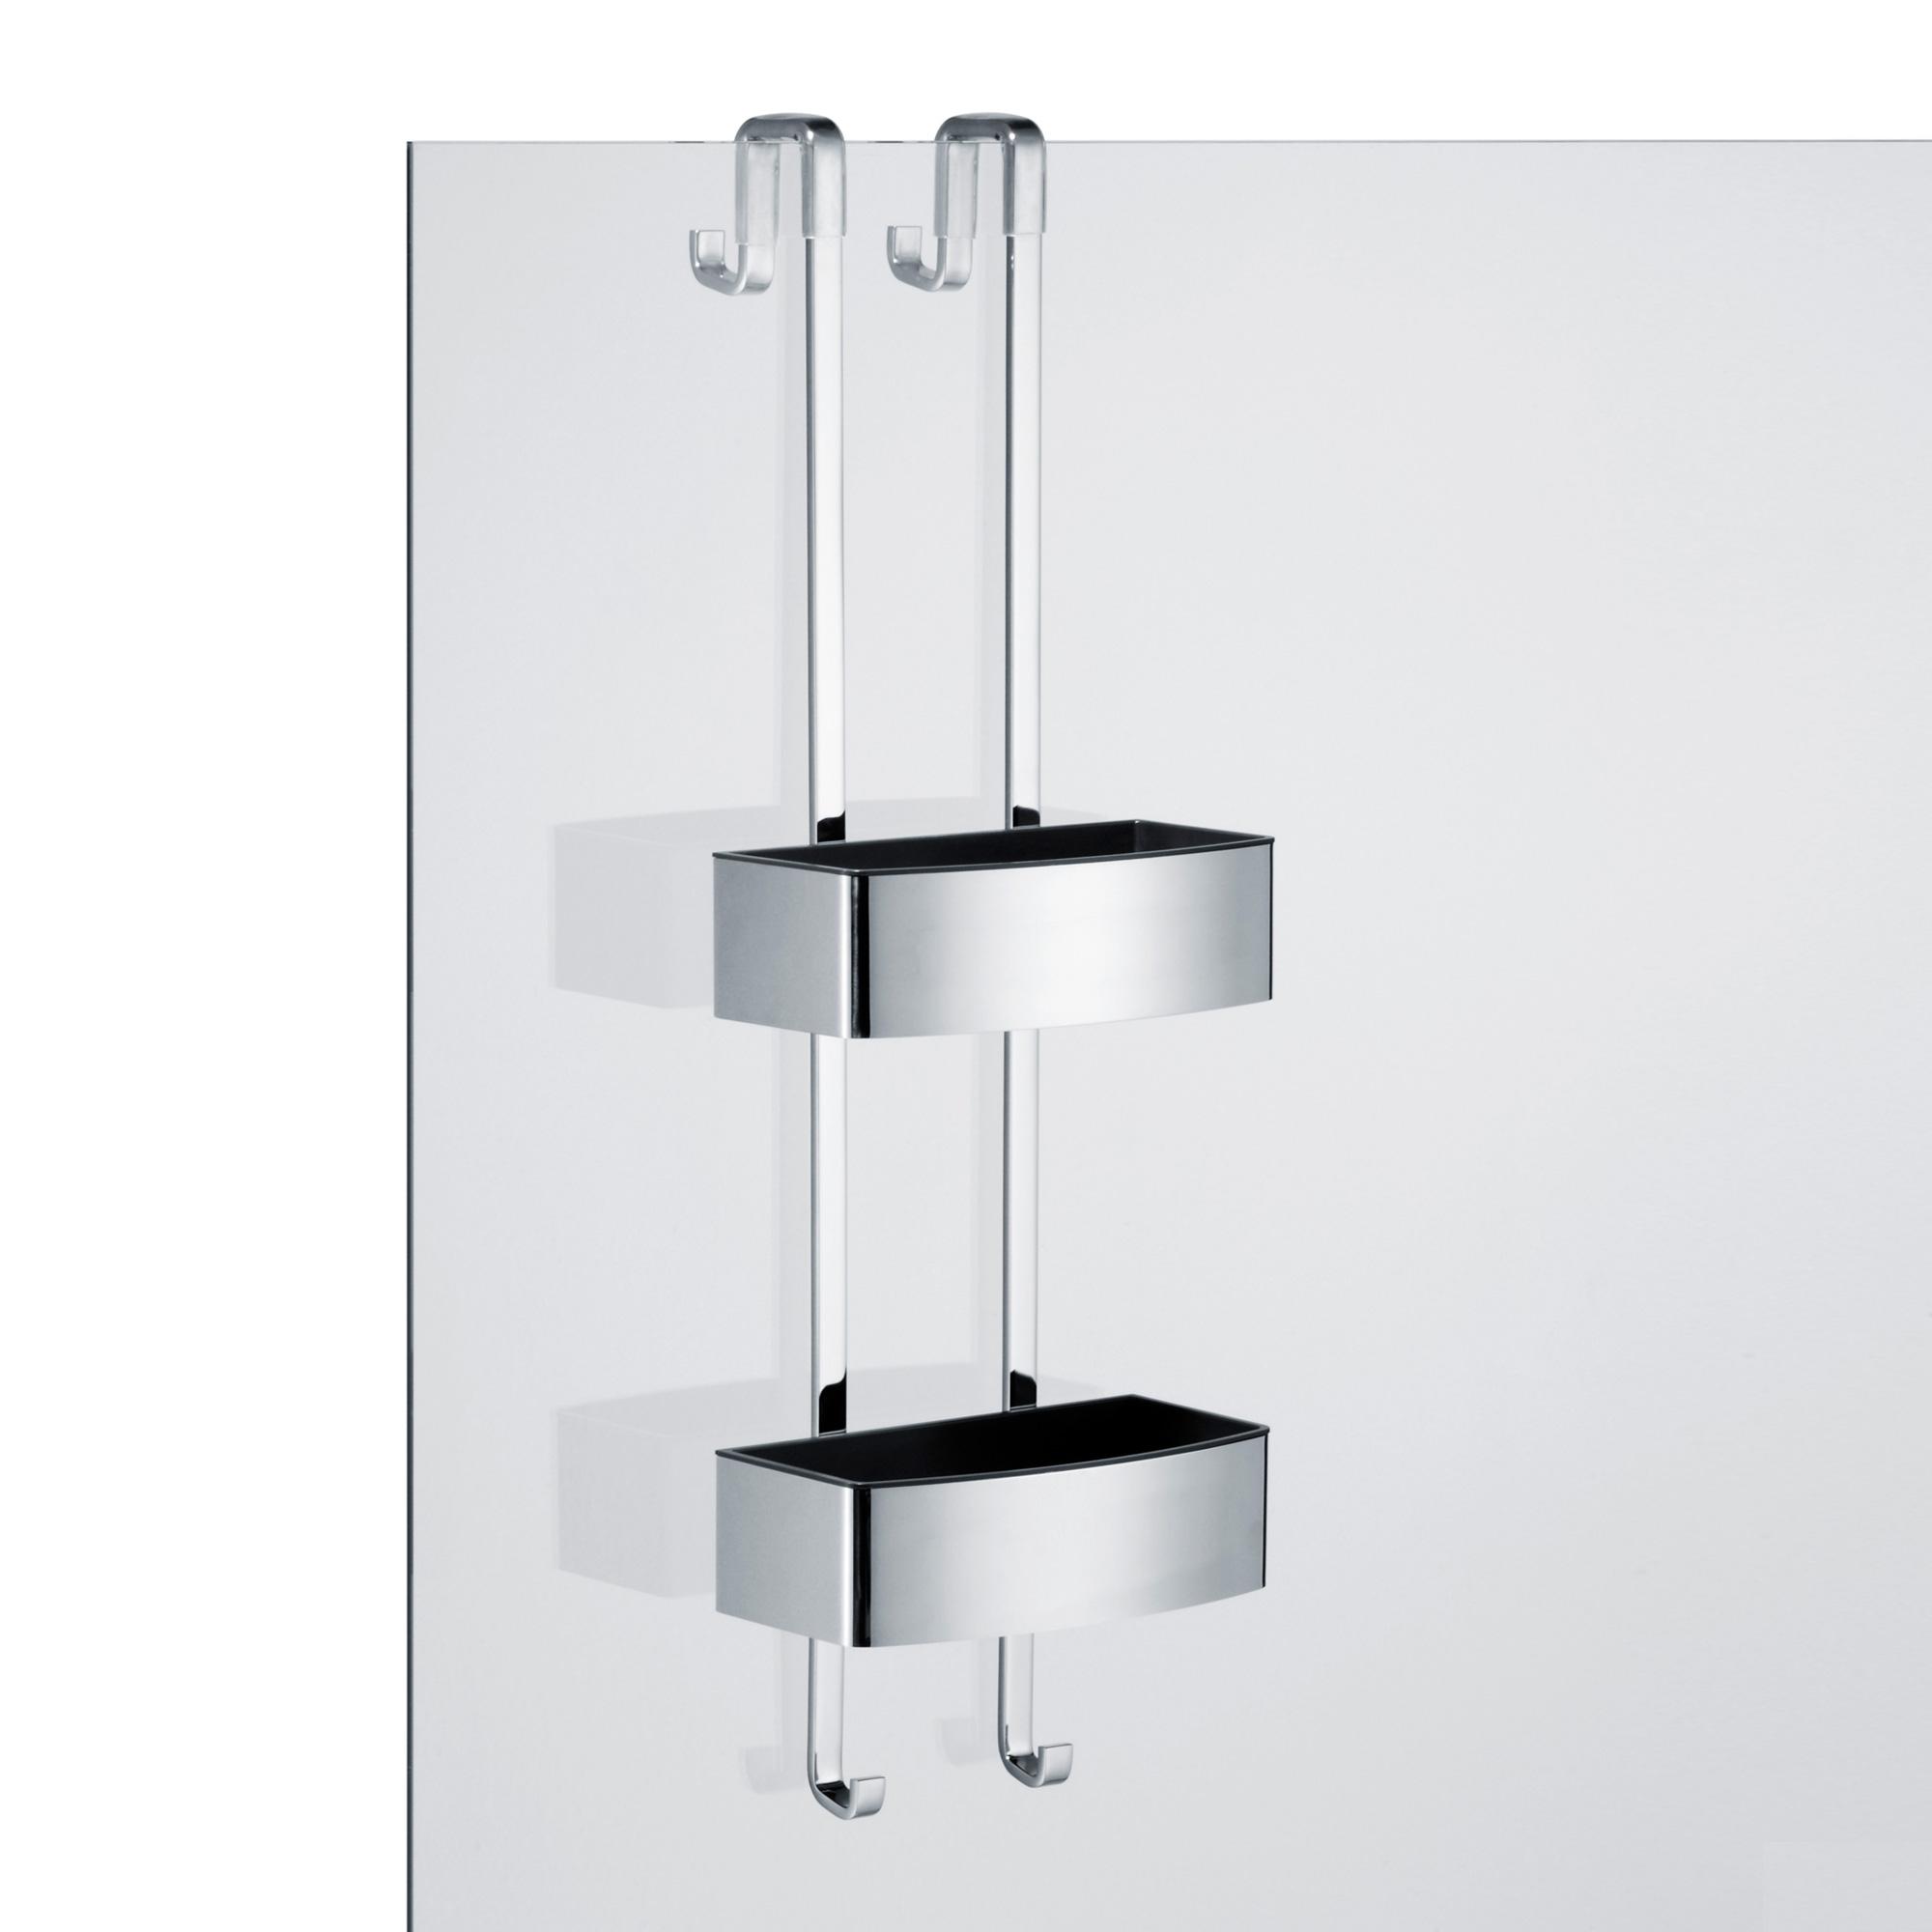 avenarius duschkombination 2 fach 9014066010 reuter onlineshop. Black Bedroom Furniture Sets. Home Design Ideas